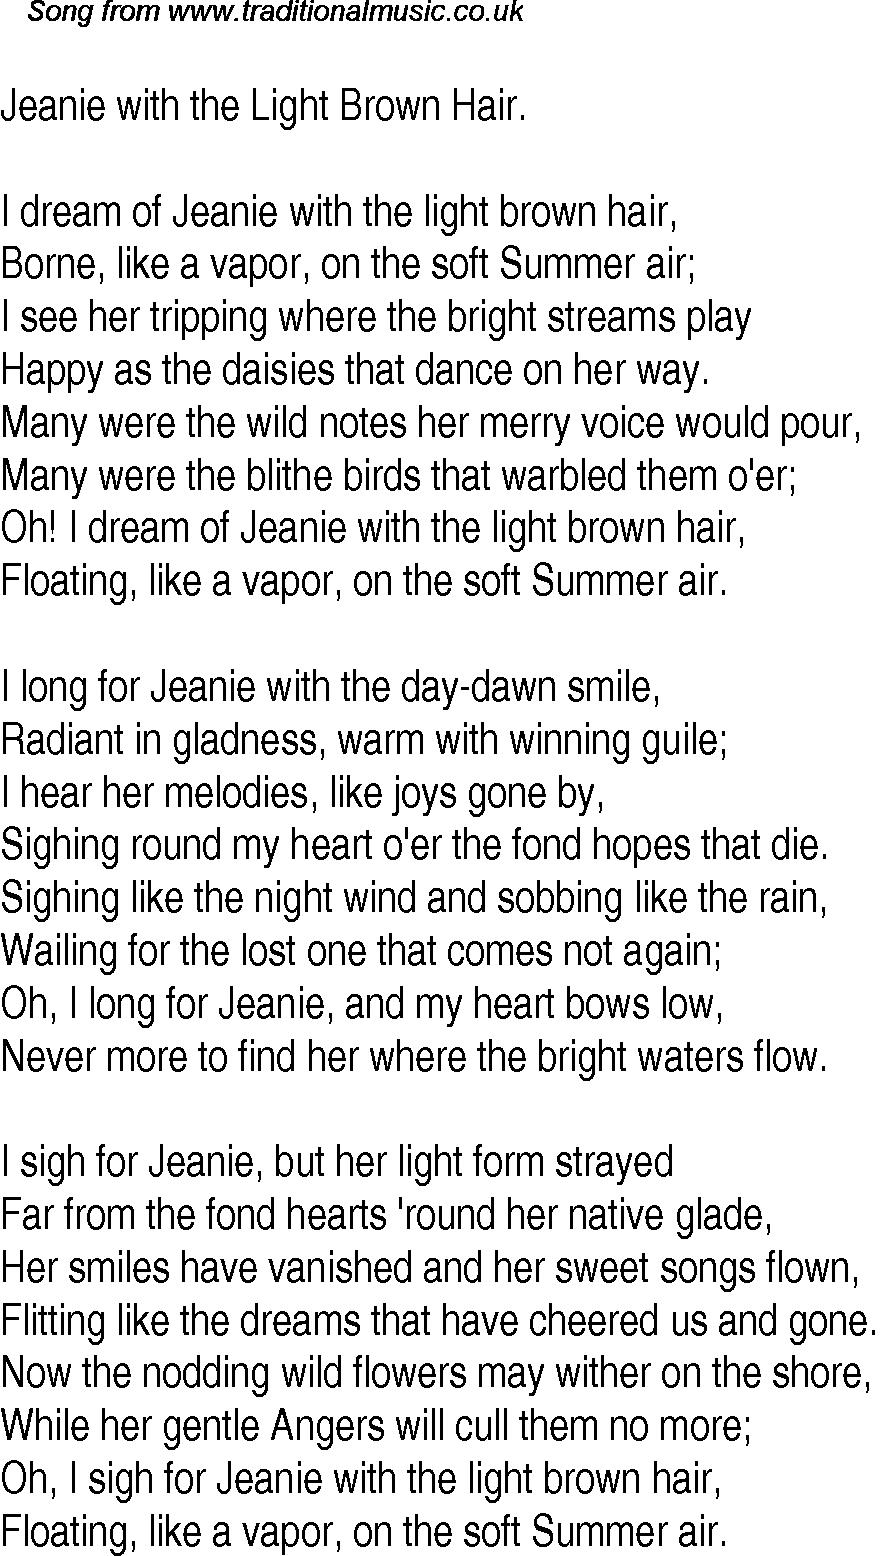 Jeanie Light Brown Hair Lyrics